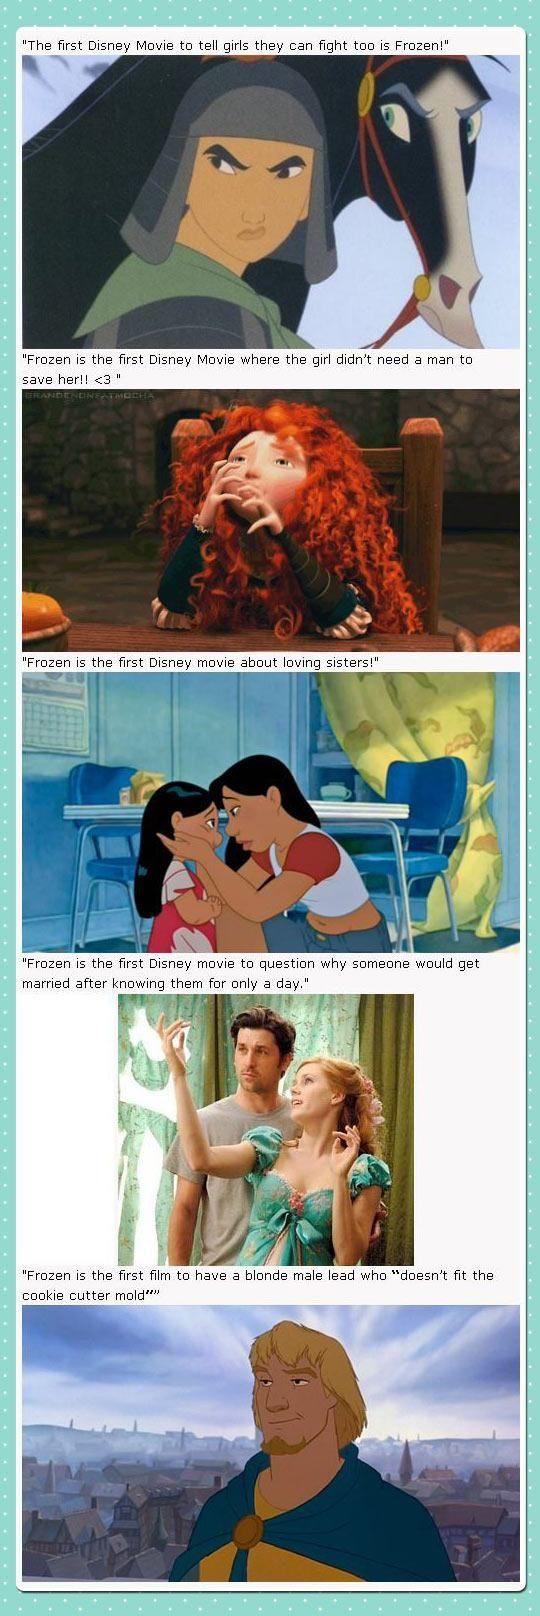 Movies According to Tumblr (19 Pics)